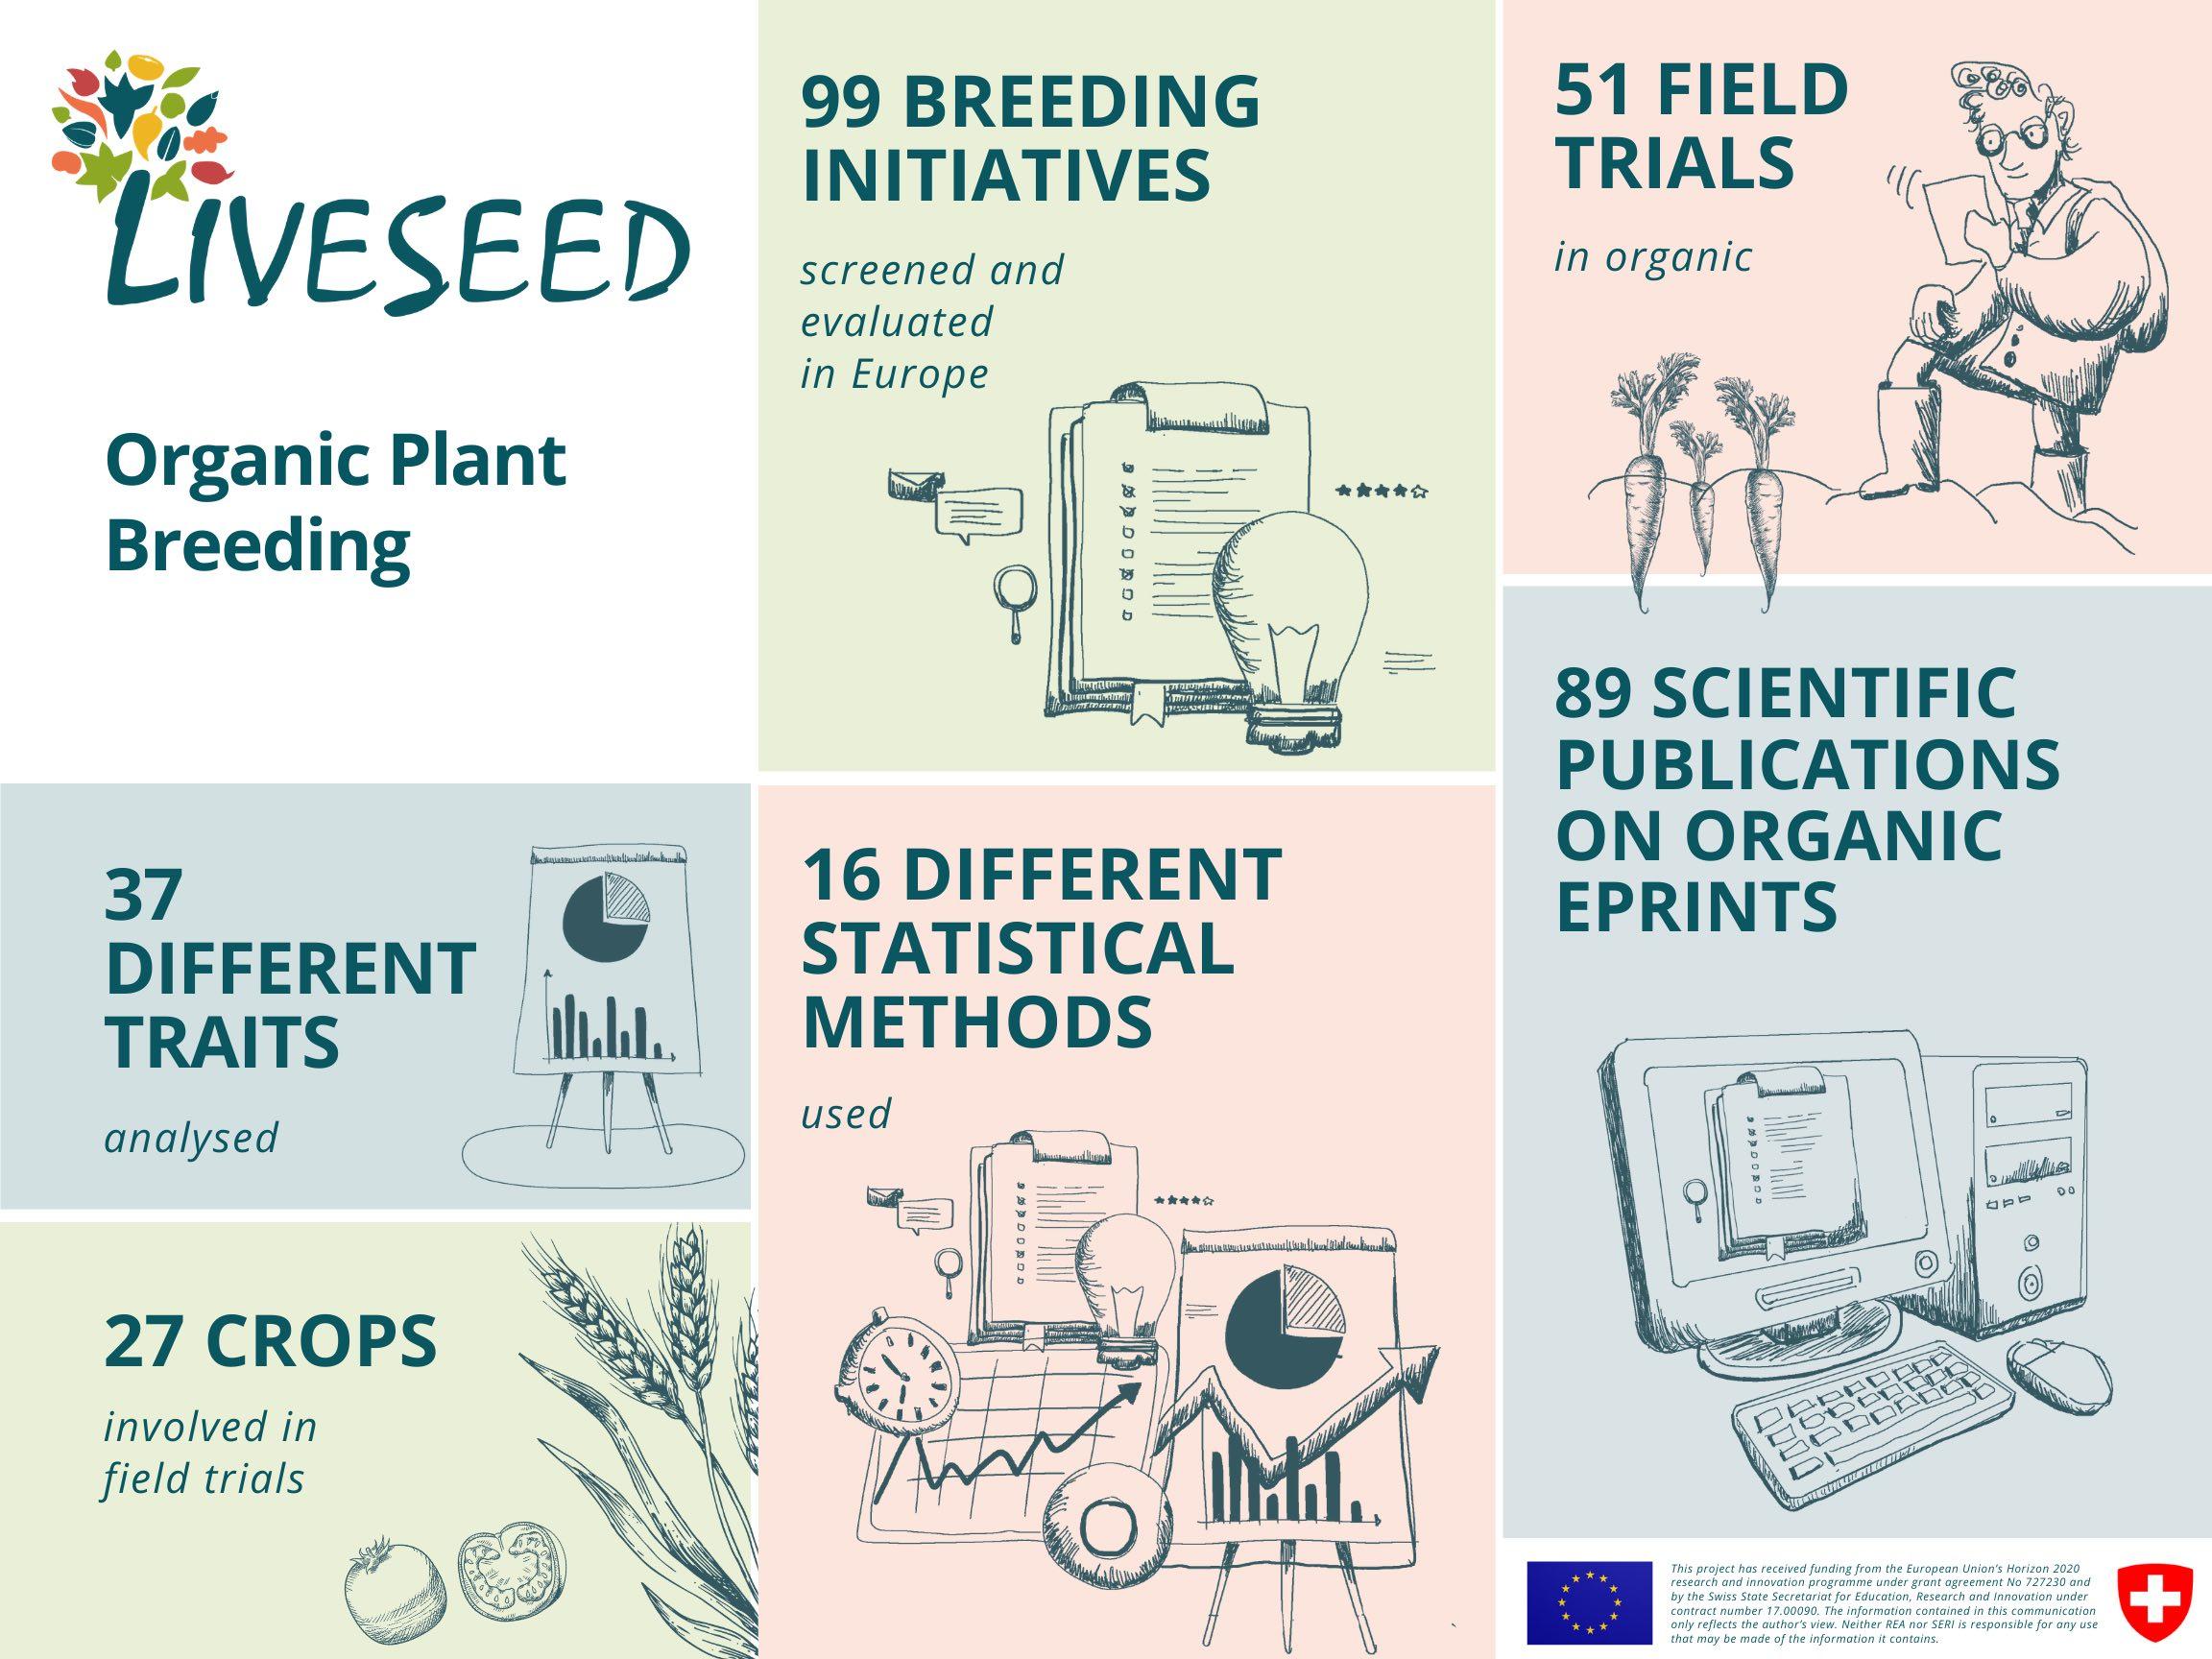 Organic plant breeding